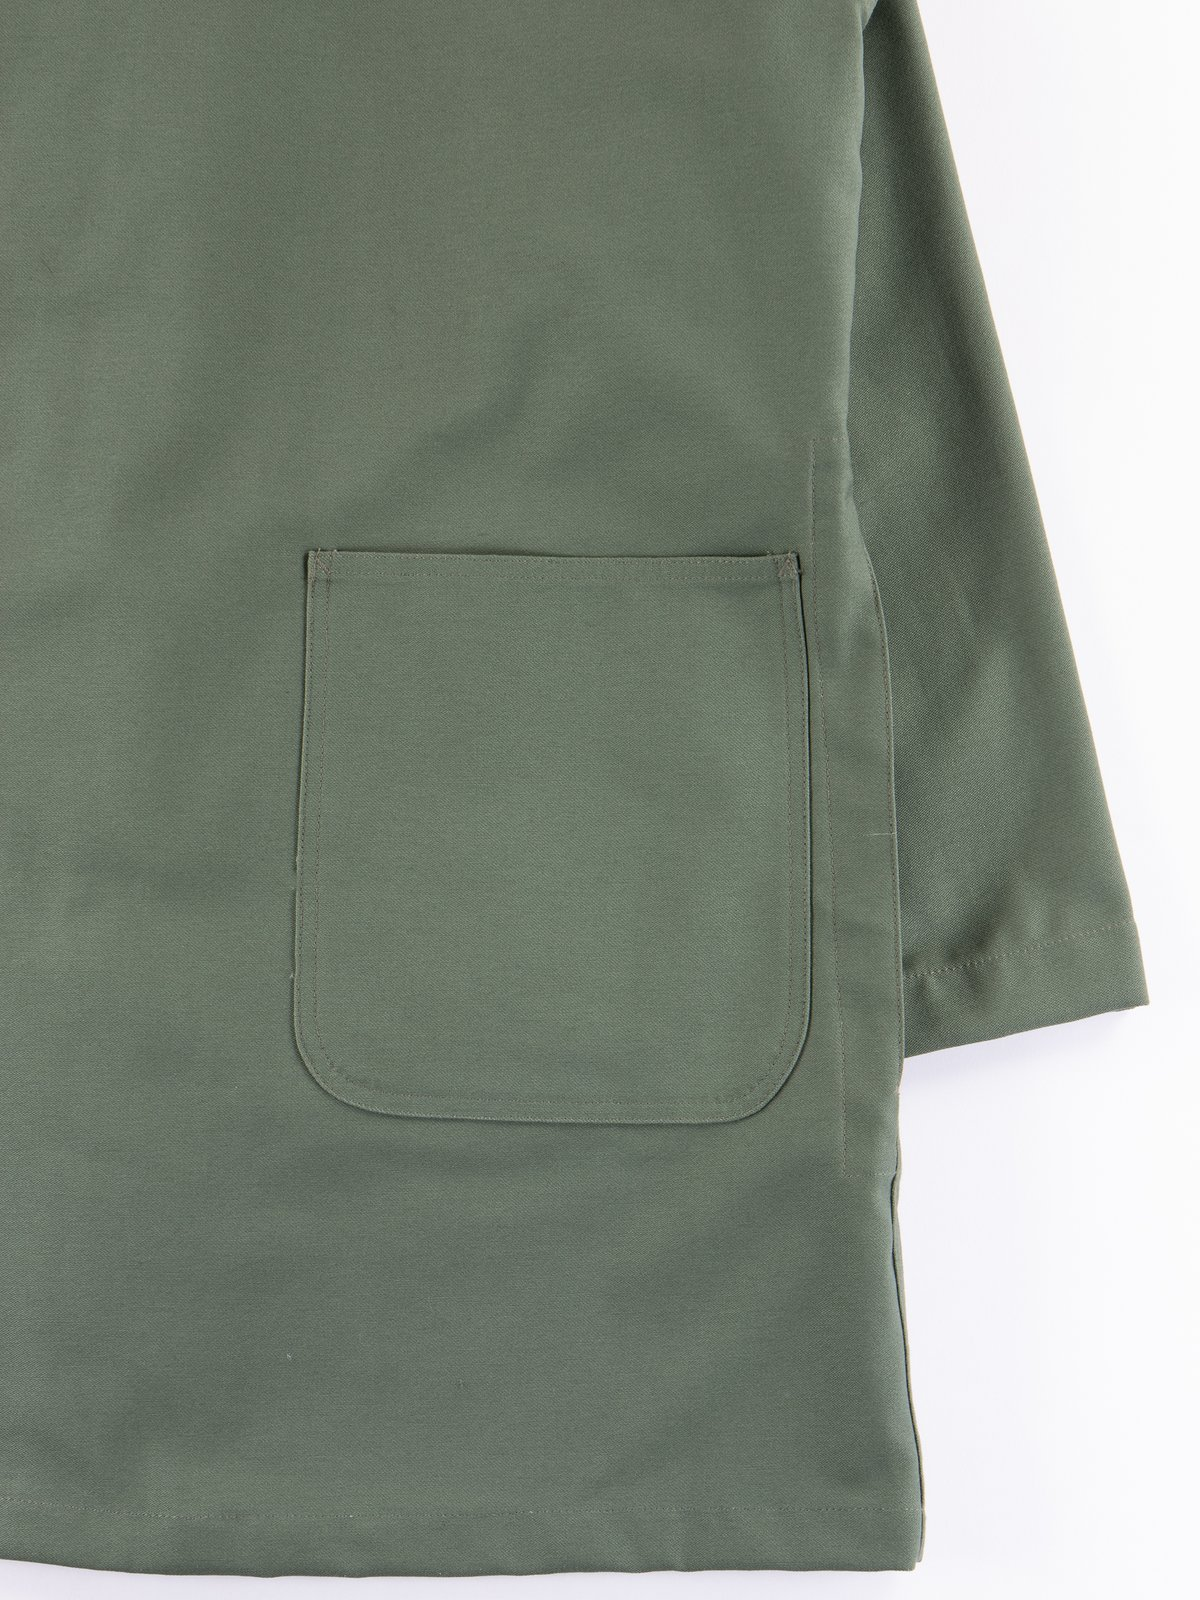 Olive Reversed Sateen Shop Coat - Image 6